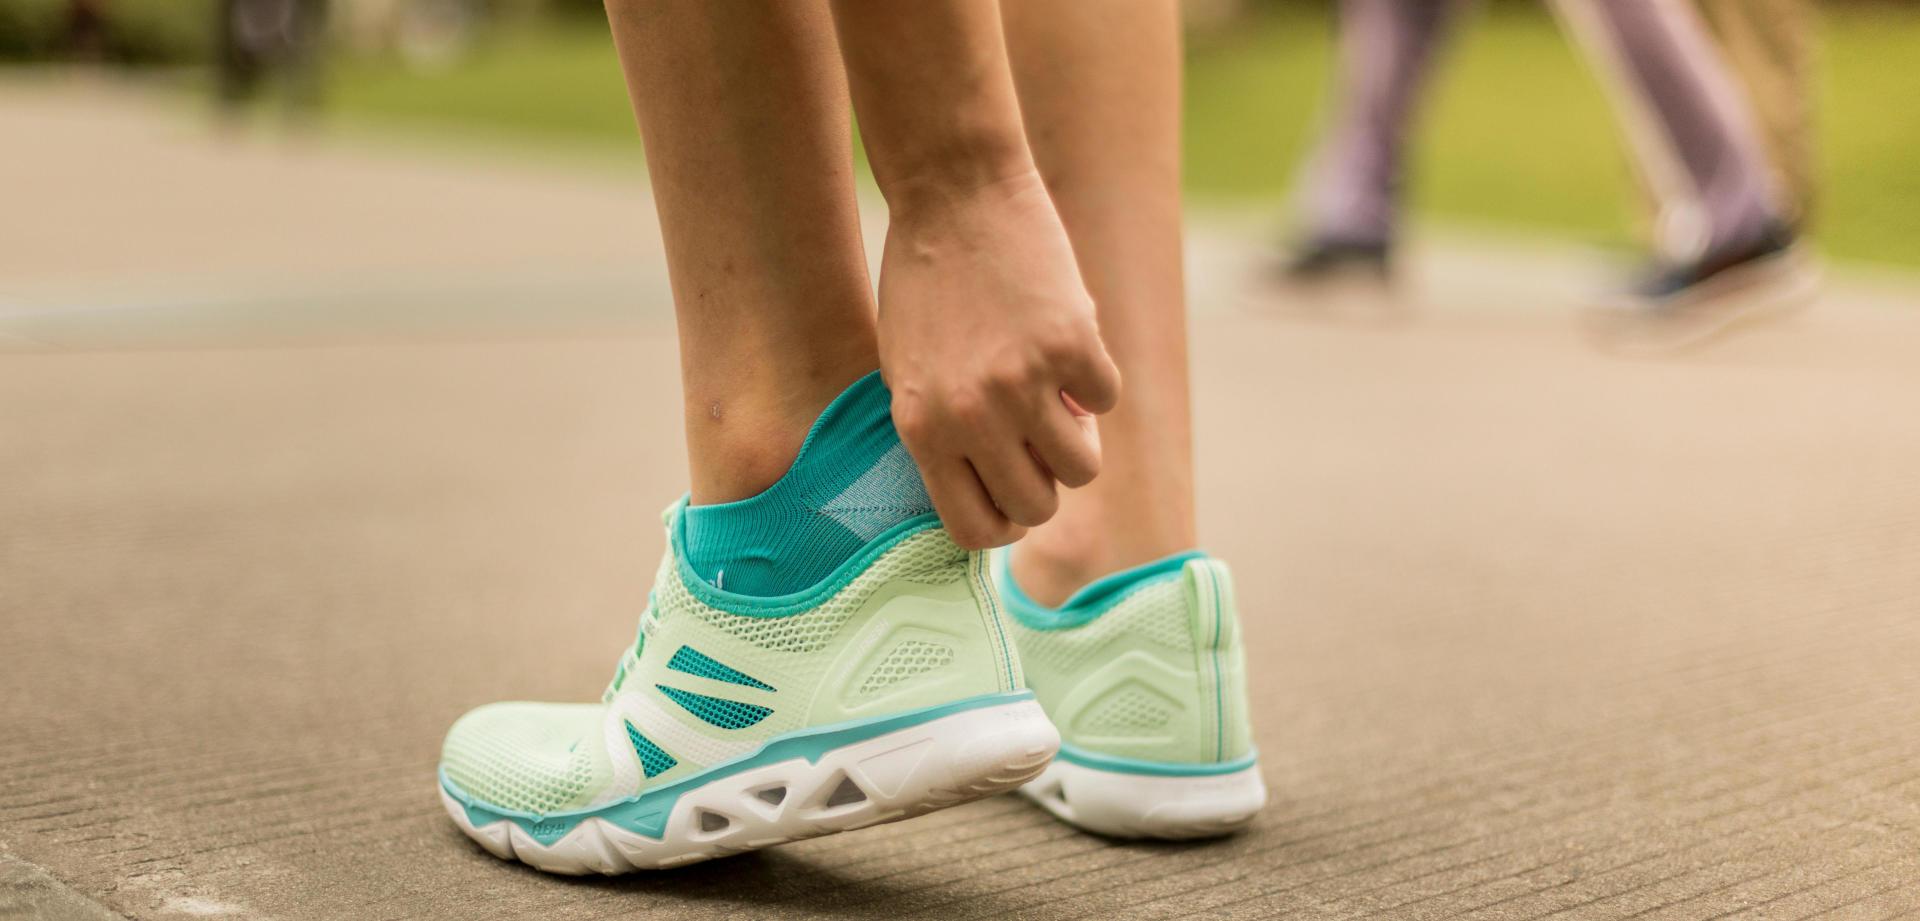 conseils-transpiration-des-pieds